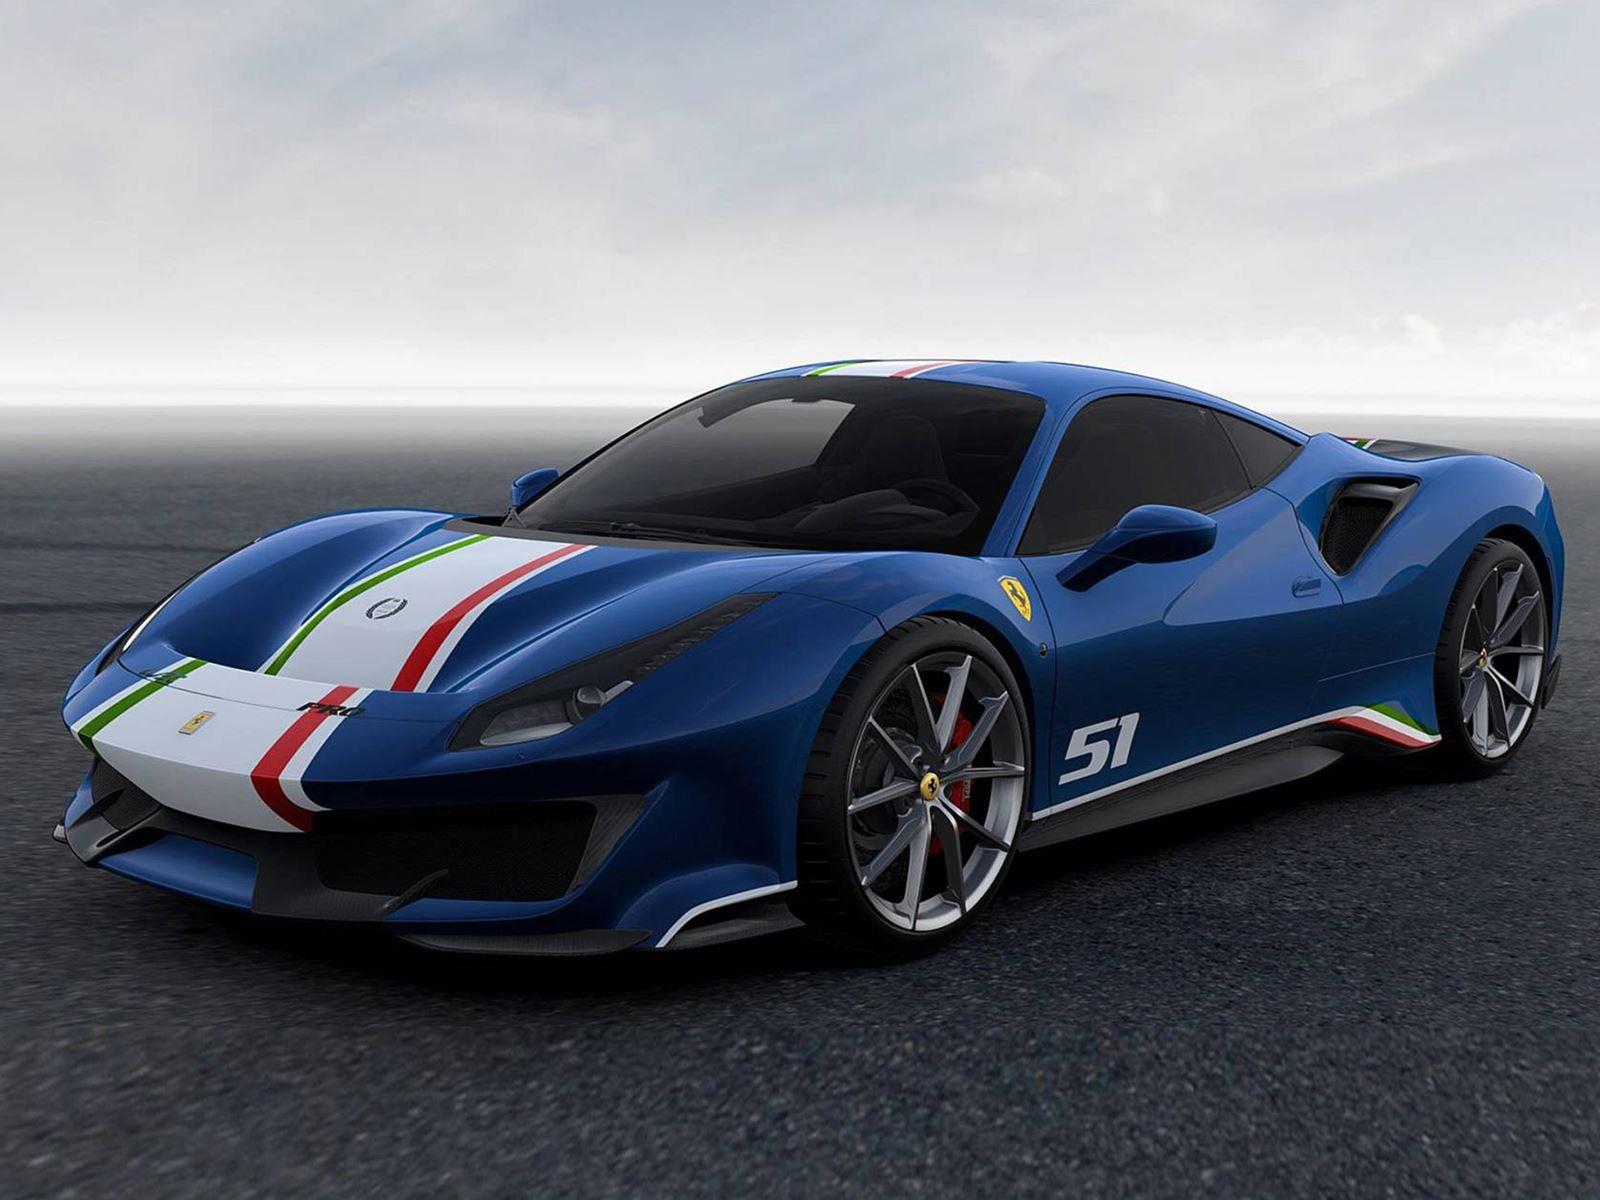 ferrari 488 pista piloti looks even better in blue